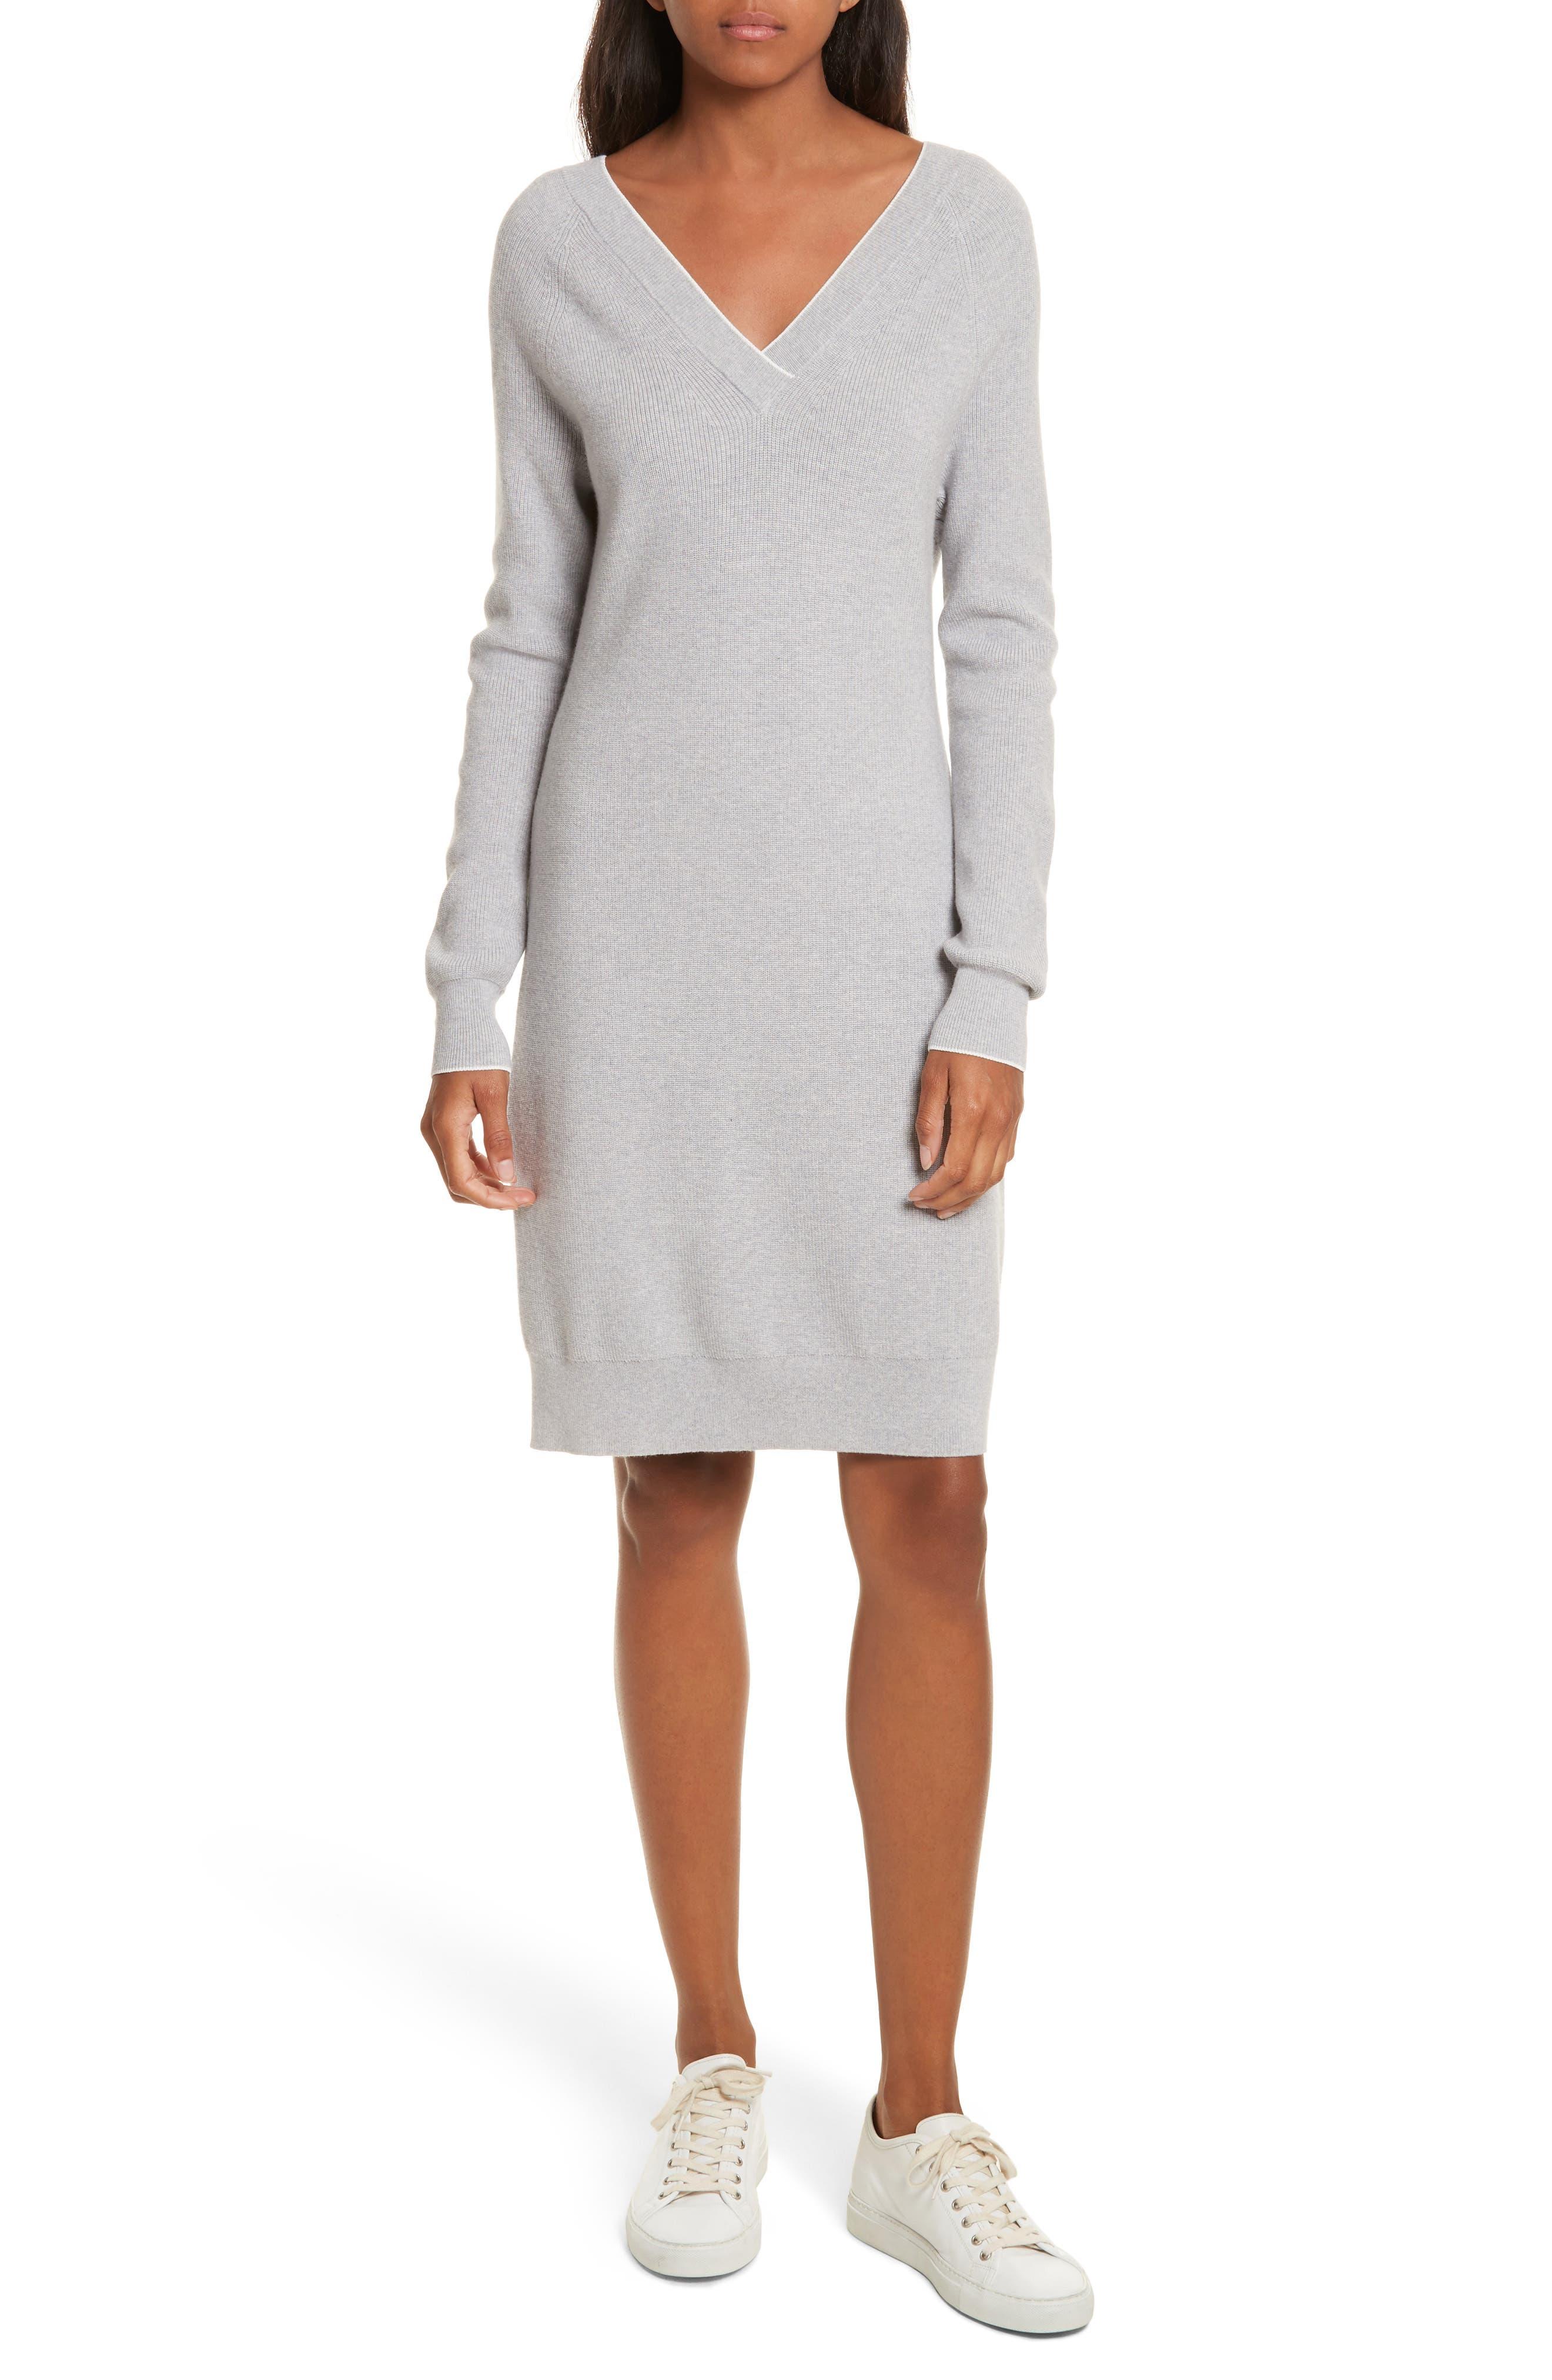 Alternate Image 1 Selected - GREY Jason Wu Wool Blend Sweater Dress